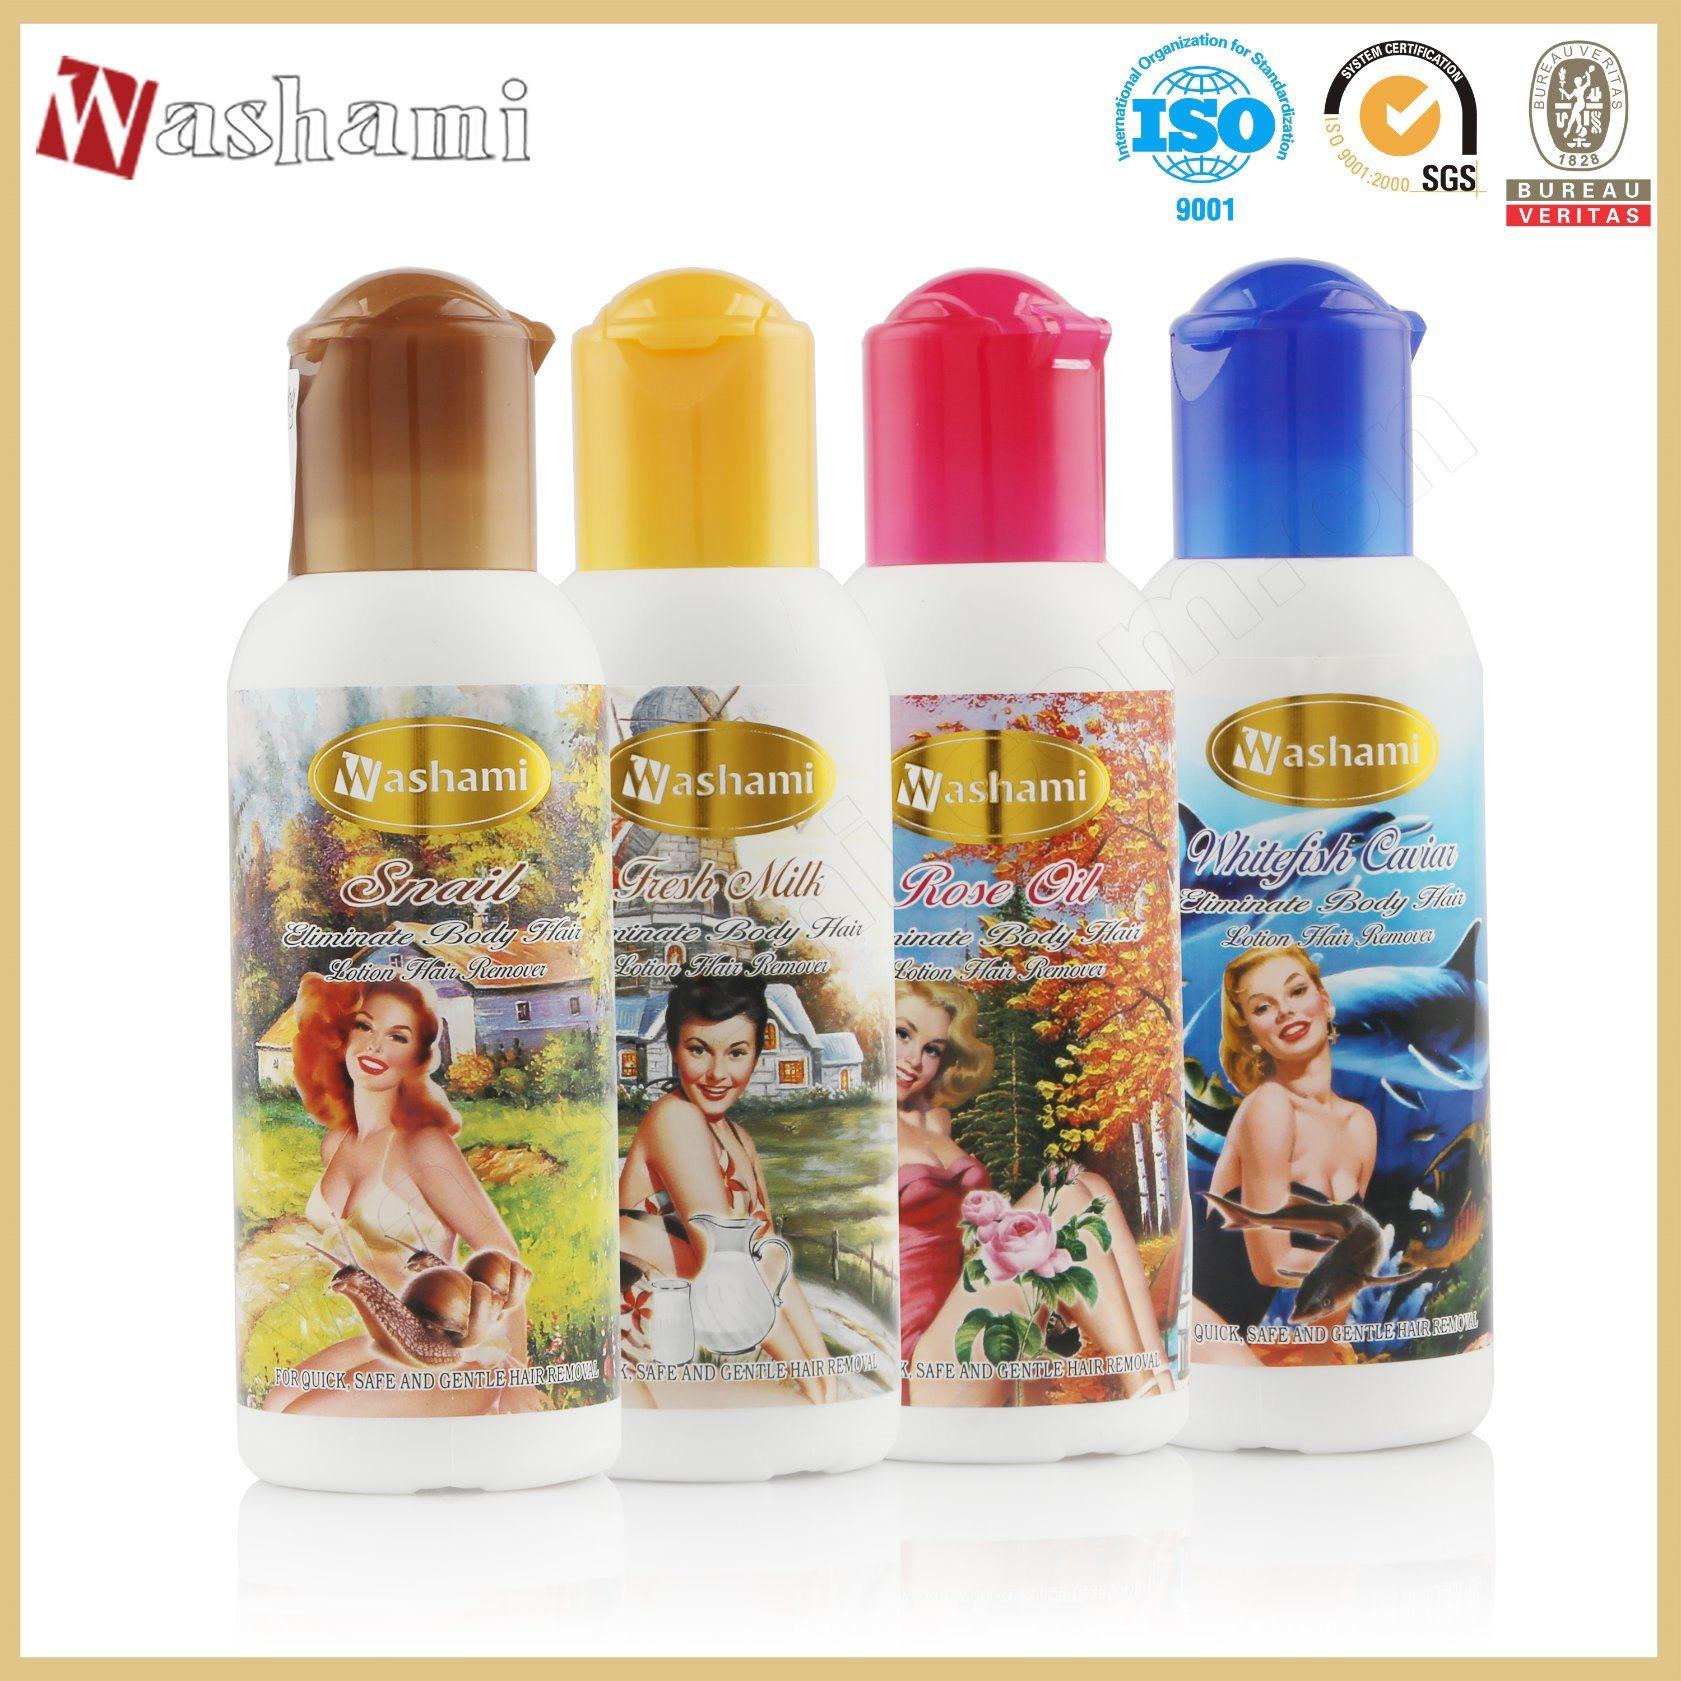 Washami Rose Oil Body Hair Depilatory Cream Hair Removal Cream for Women